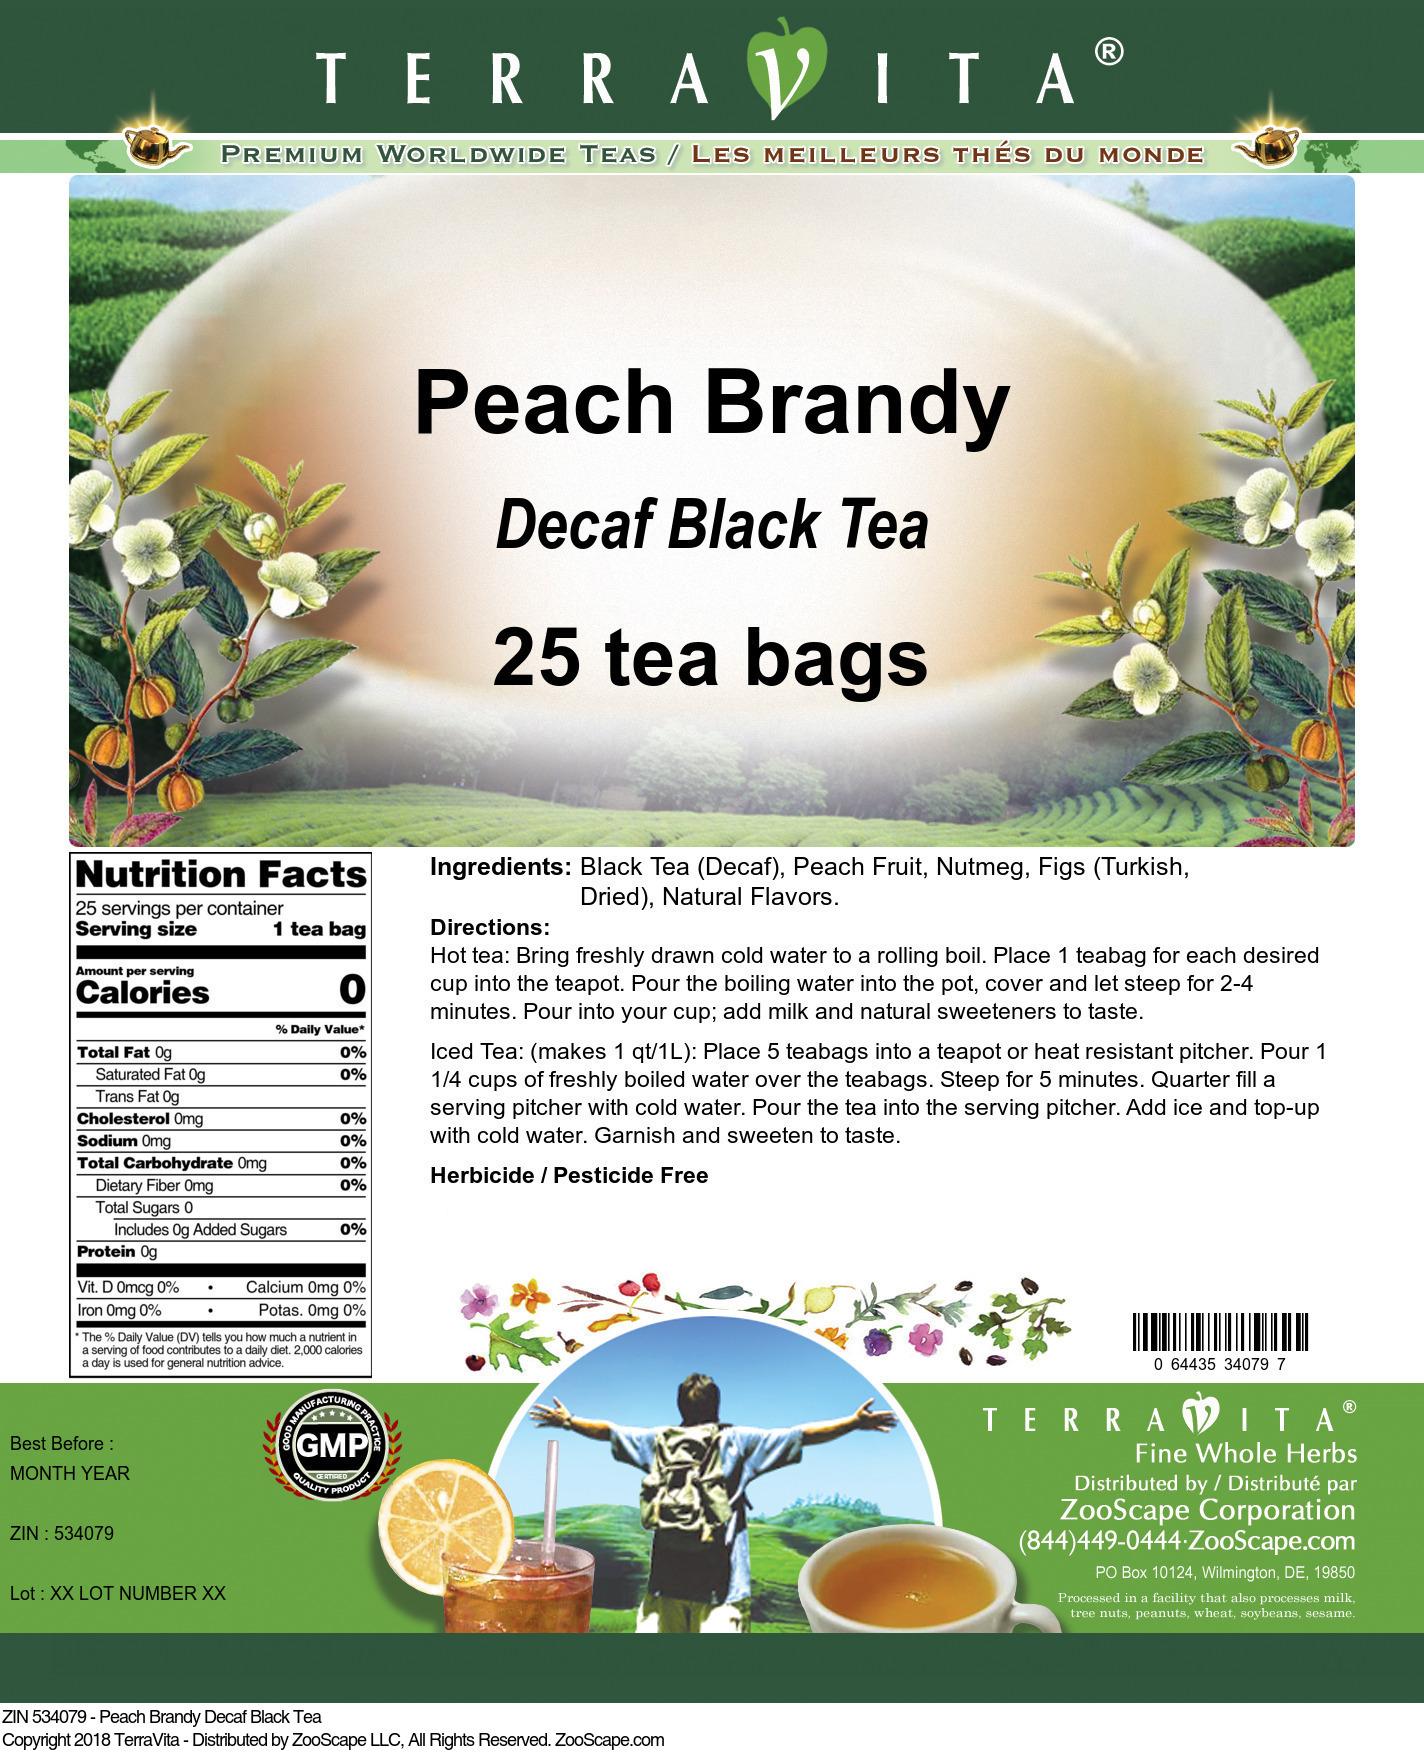 Peach Brandy Decaf Black Tea